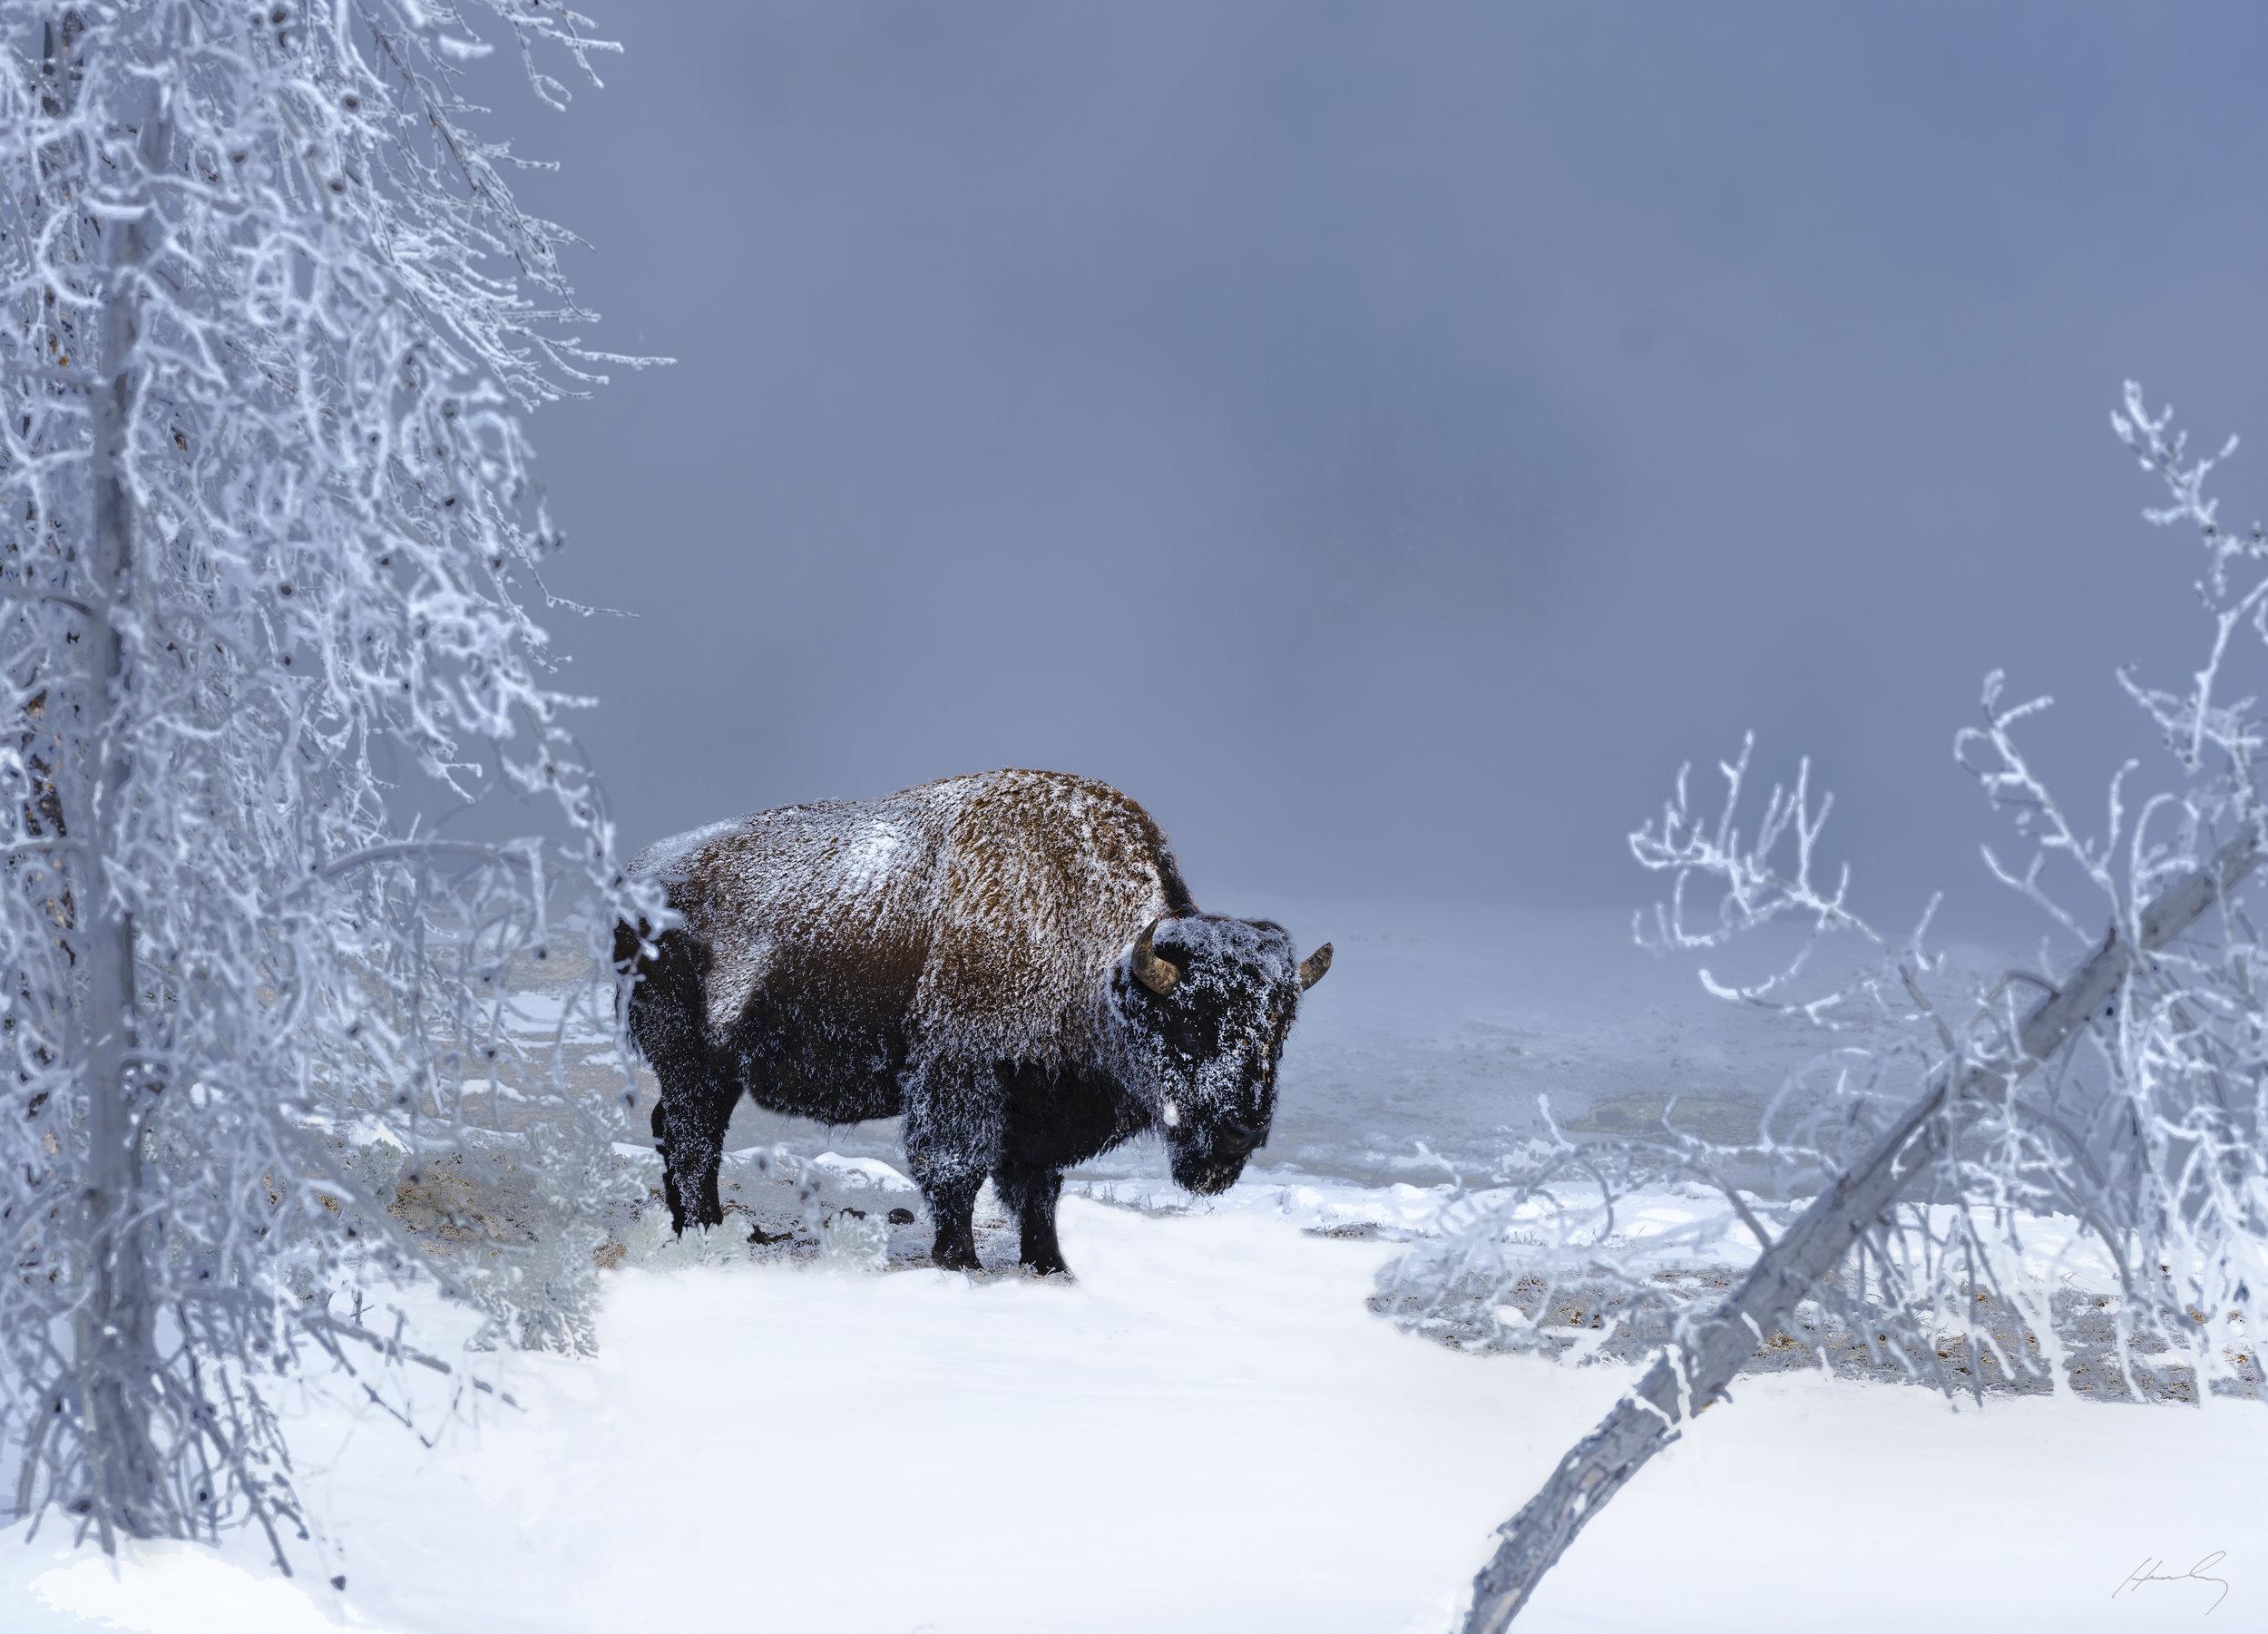 """Buffalo at 27 Below Zero"" Yellowstone N.P., Wyoming"